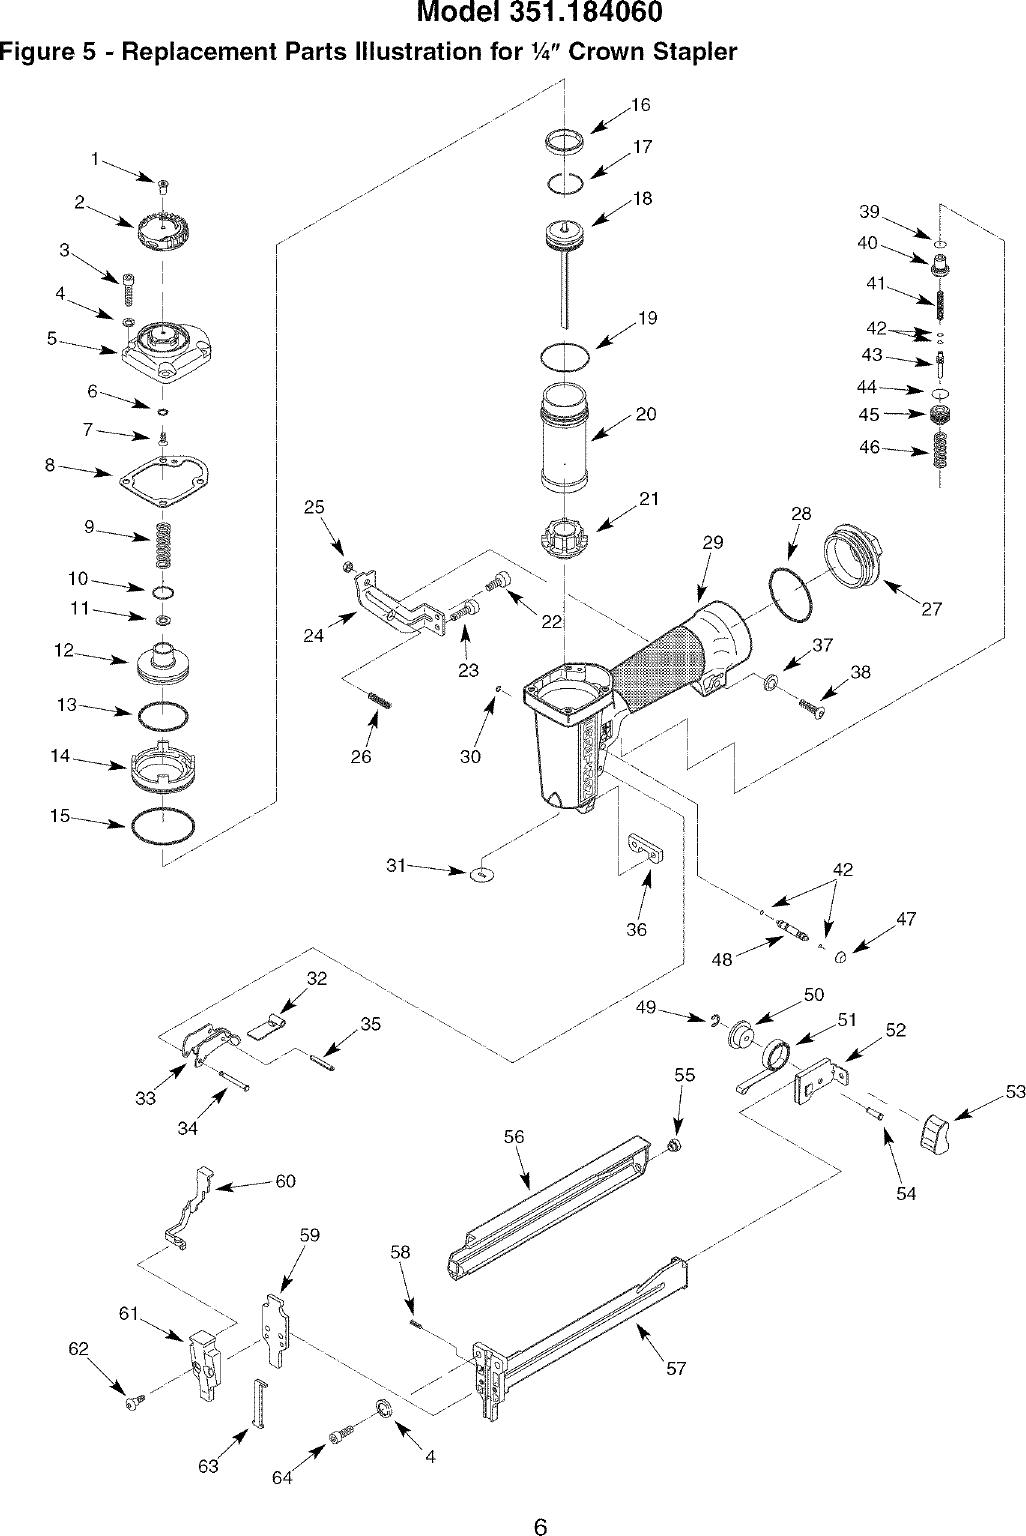 Craftsman 351184060 User Manual CROWN STAPLER Manuals And